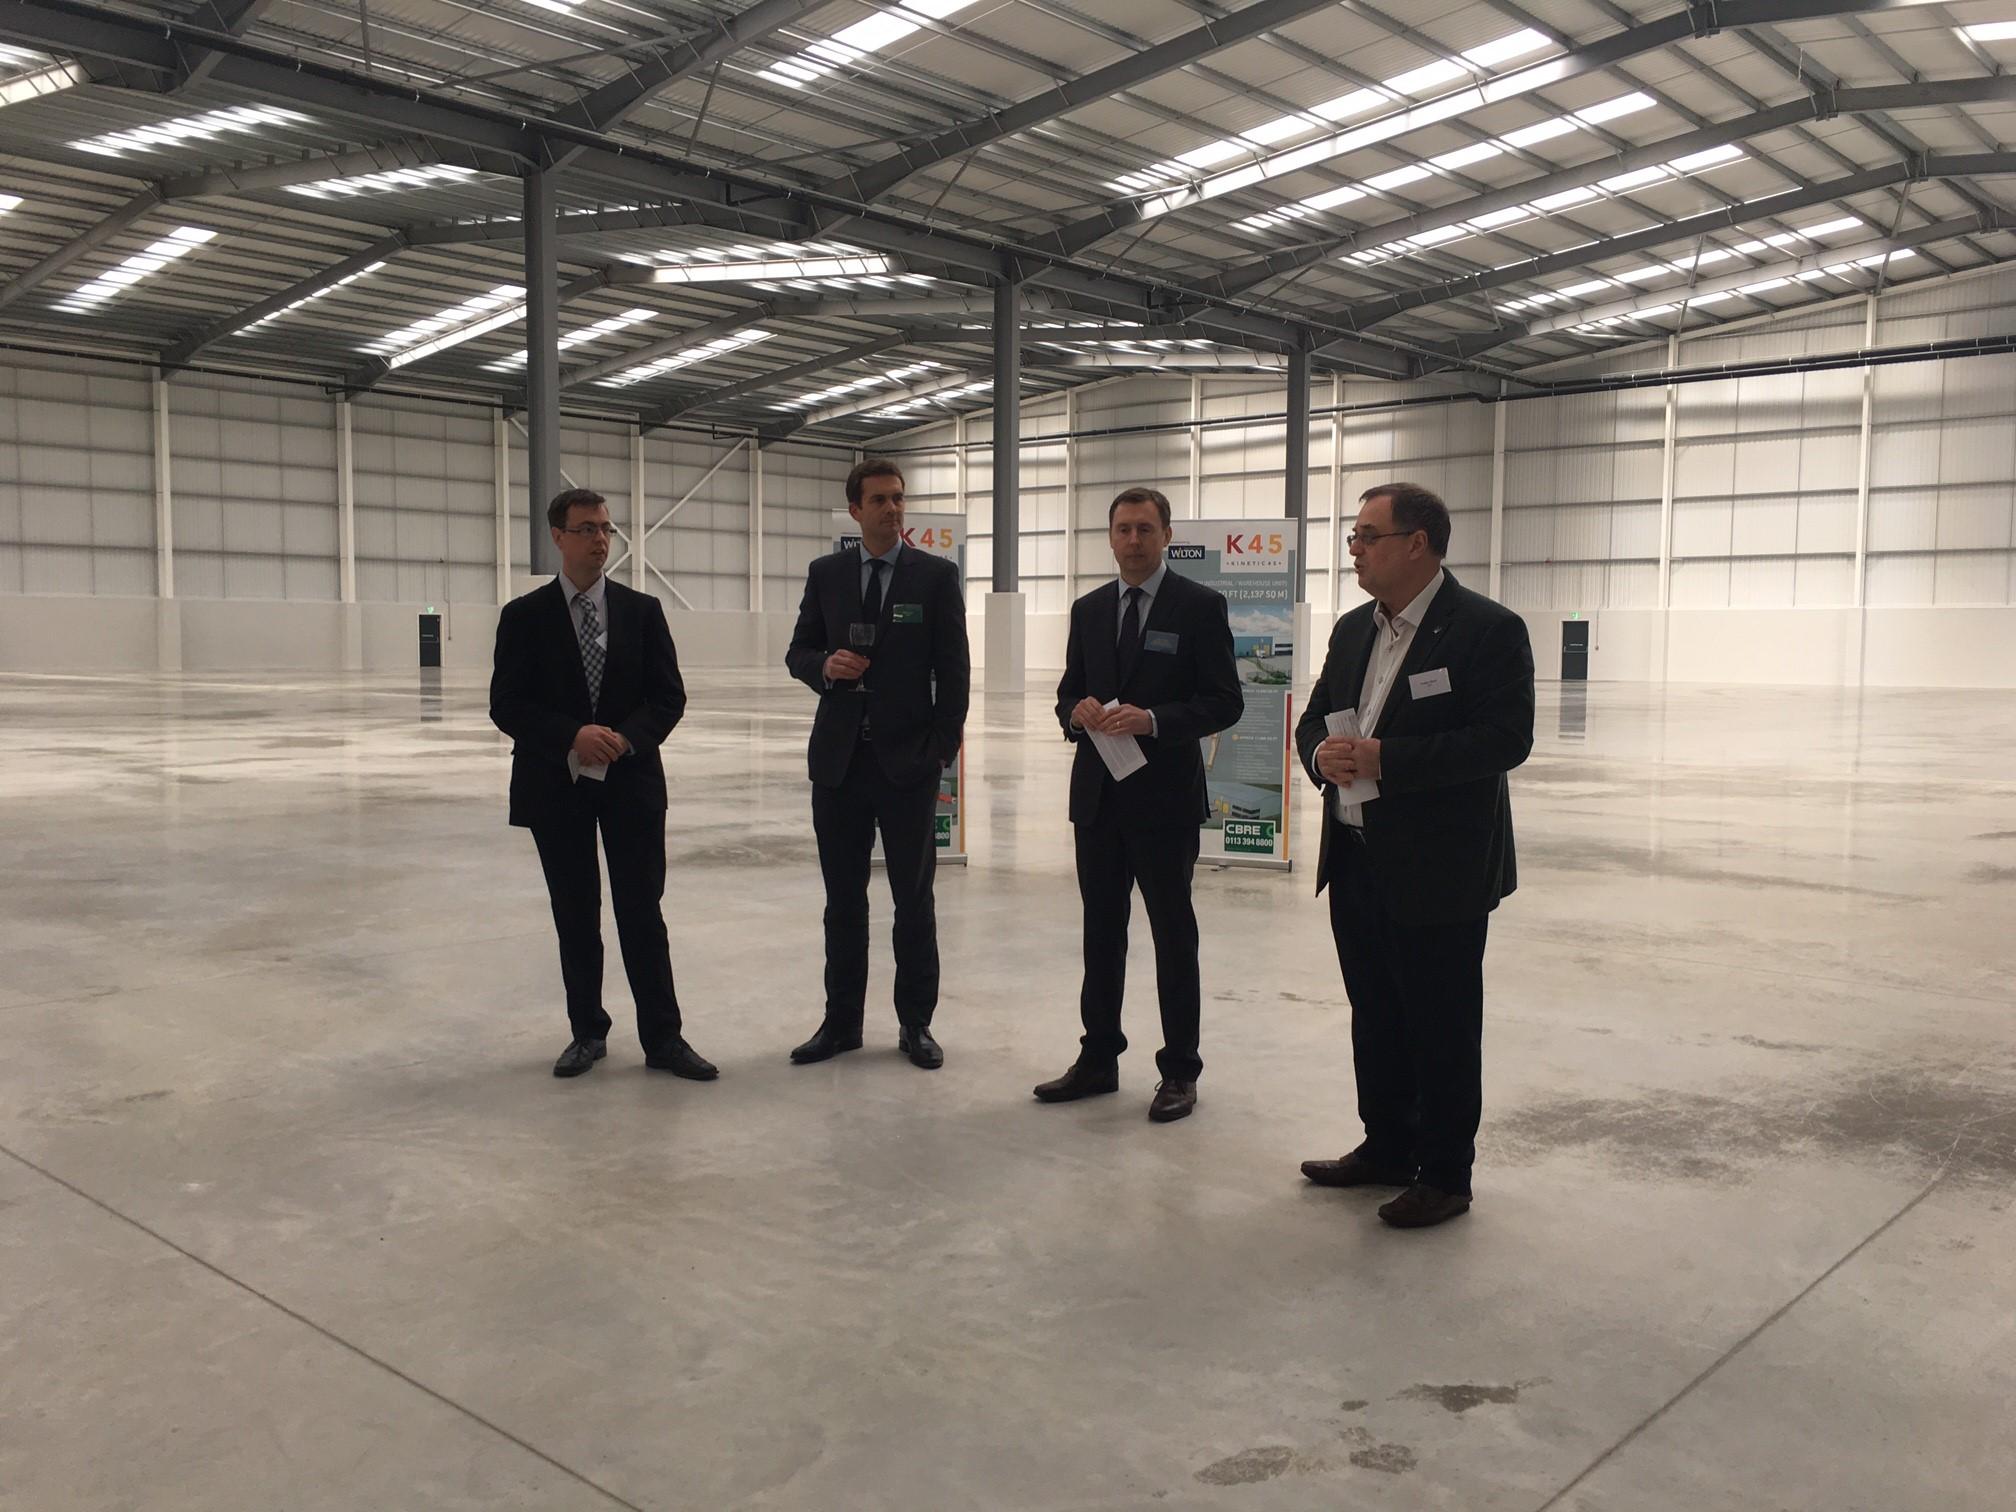 K45_launch_Mark_Mills_Leeds_City_Council;_Mike_Baugh;_Jason_Stowe_Wilton_Developments;_Roger_Marsh_OBE